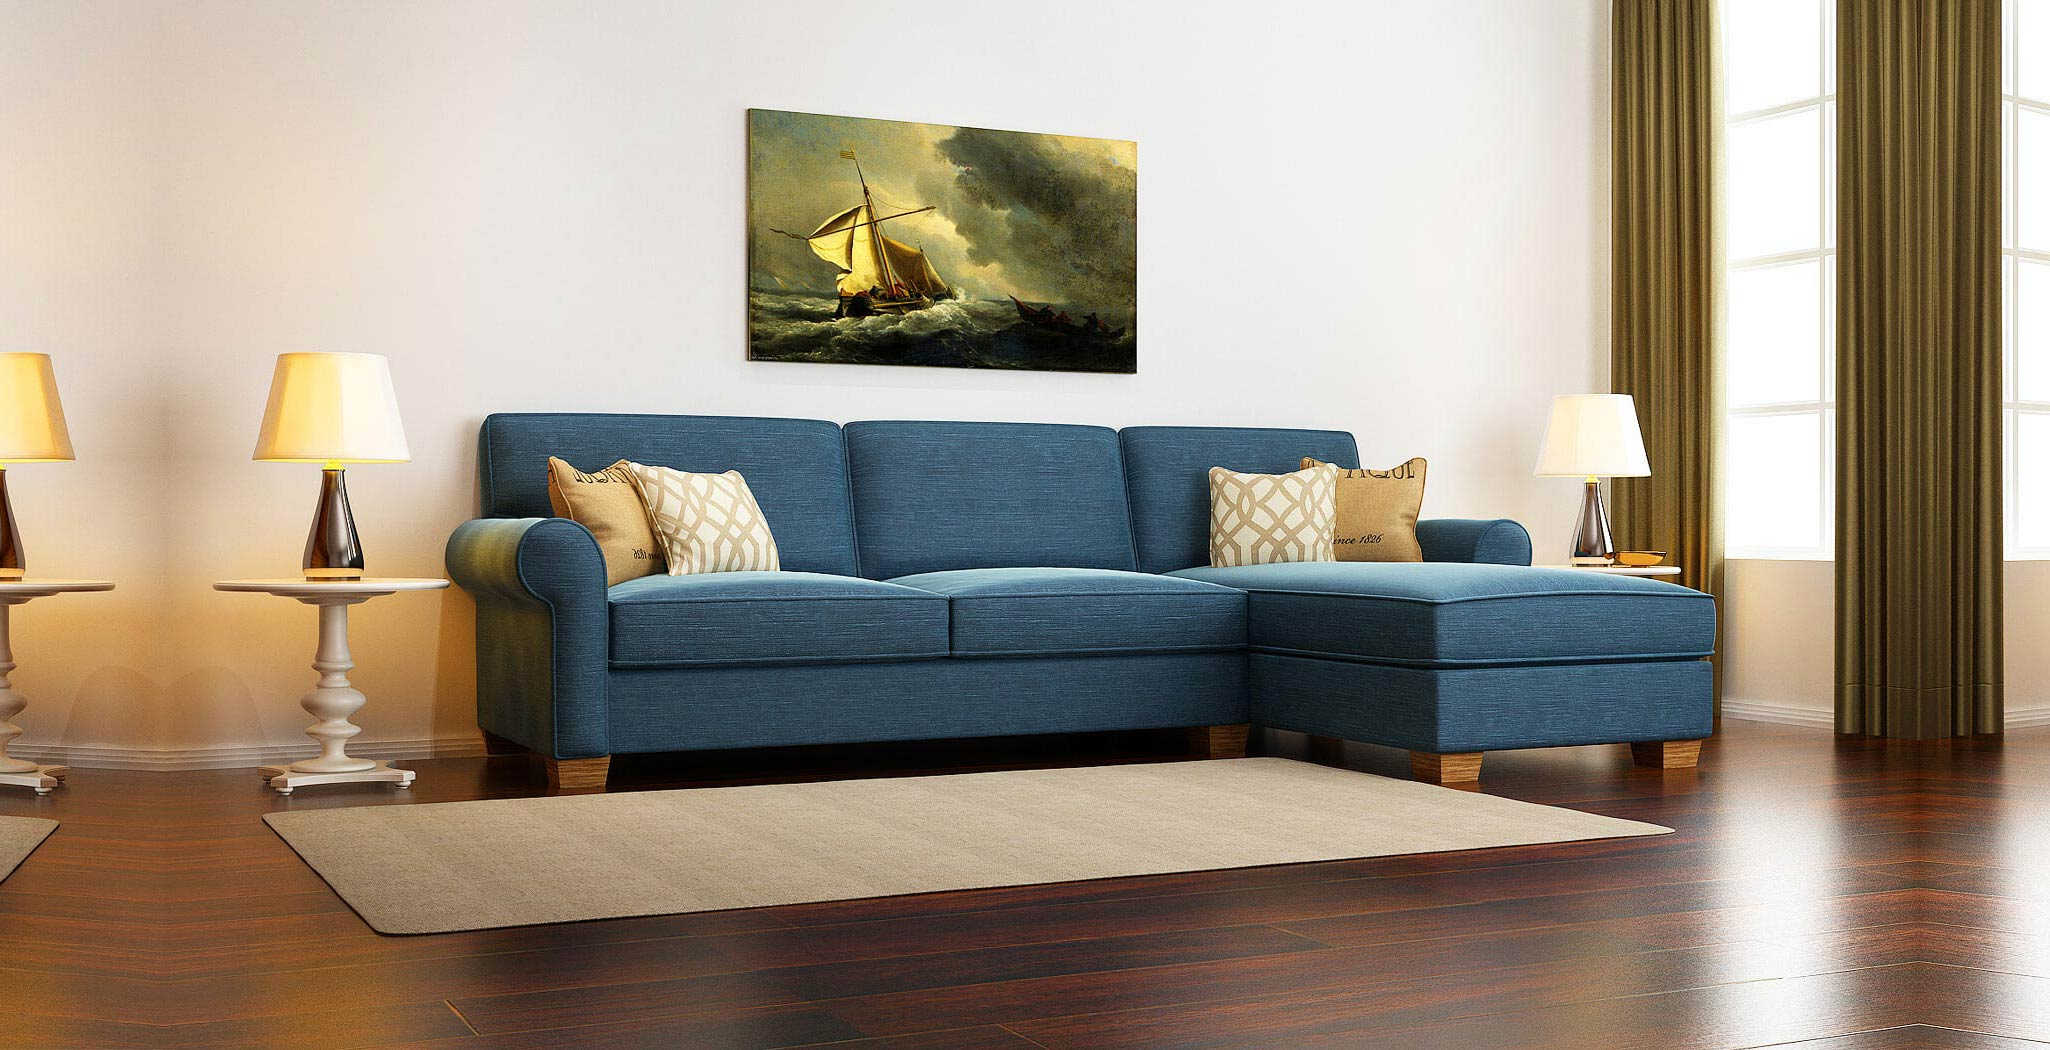 isabel panel furniture gallery 2